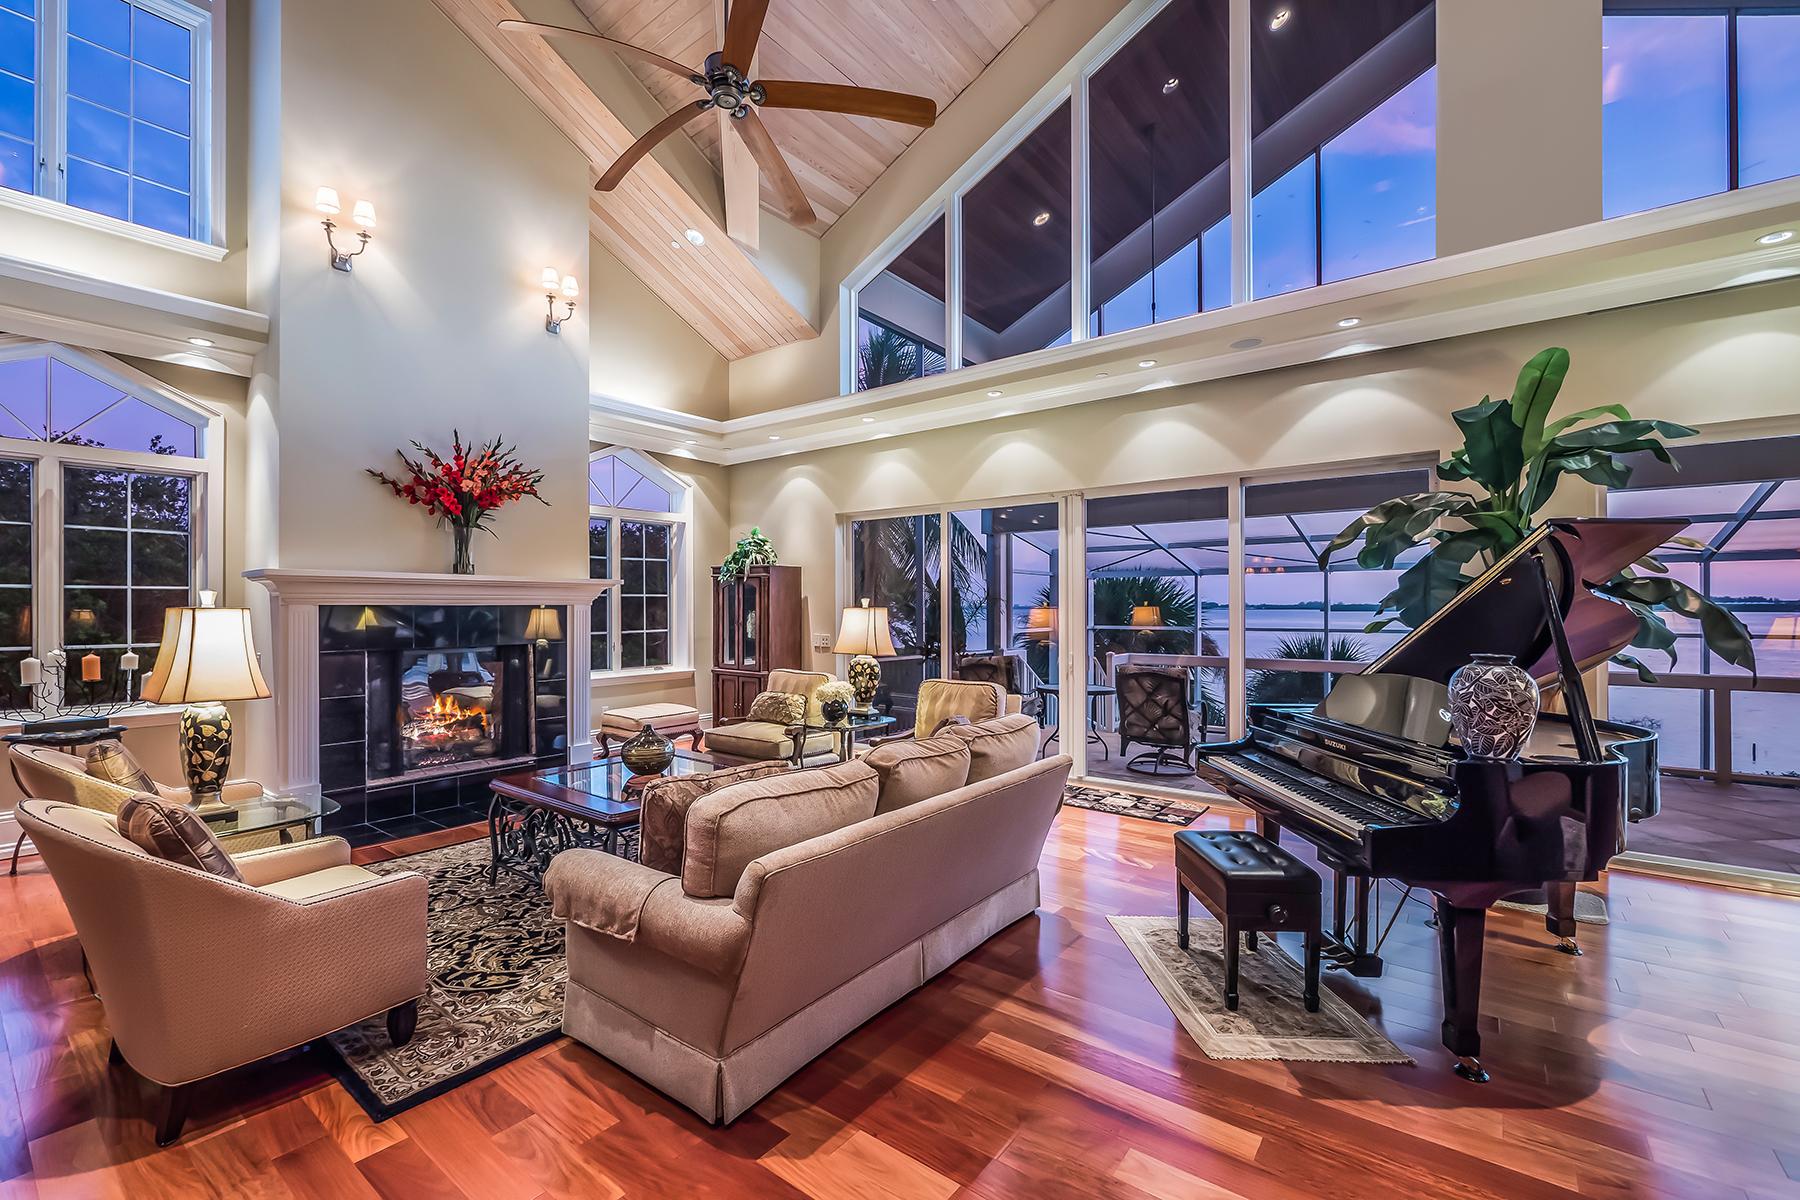 Additional photo for property listing at BRADENTON 39  Tidy Island Blvd,  Bradenton, Florida 34210 United States